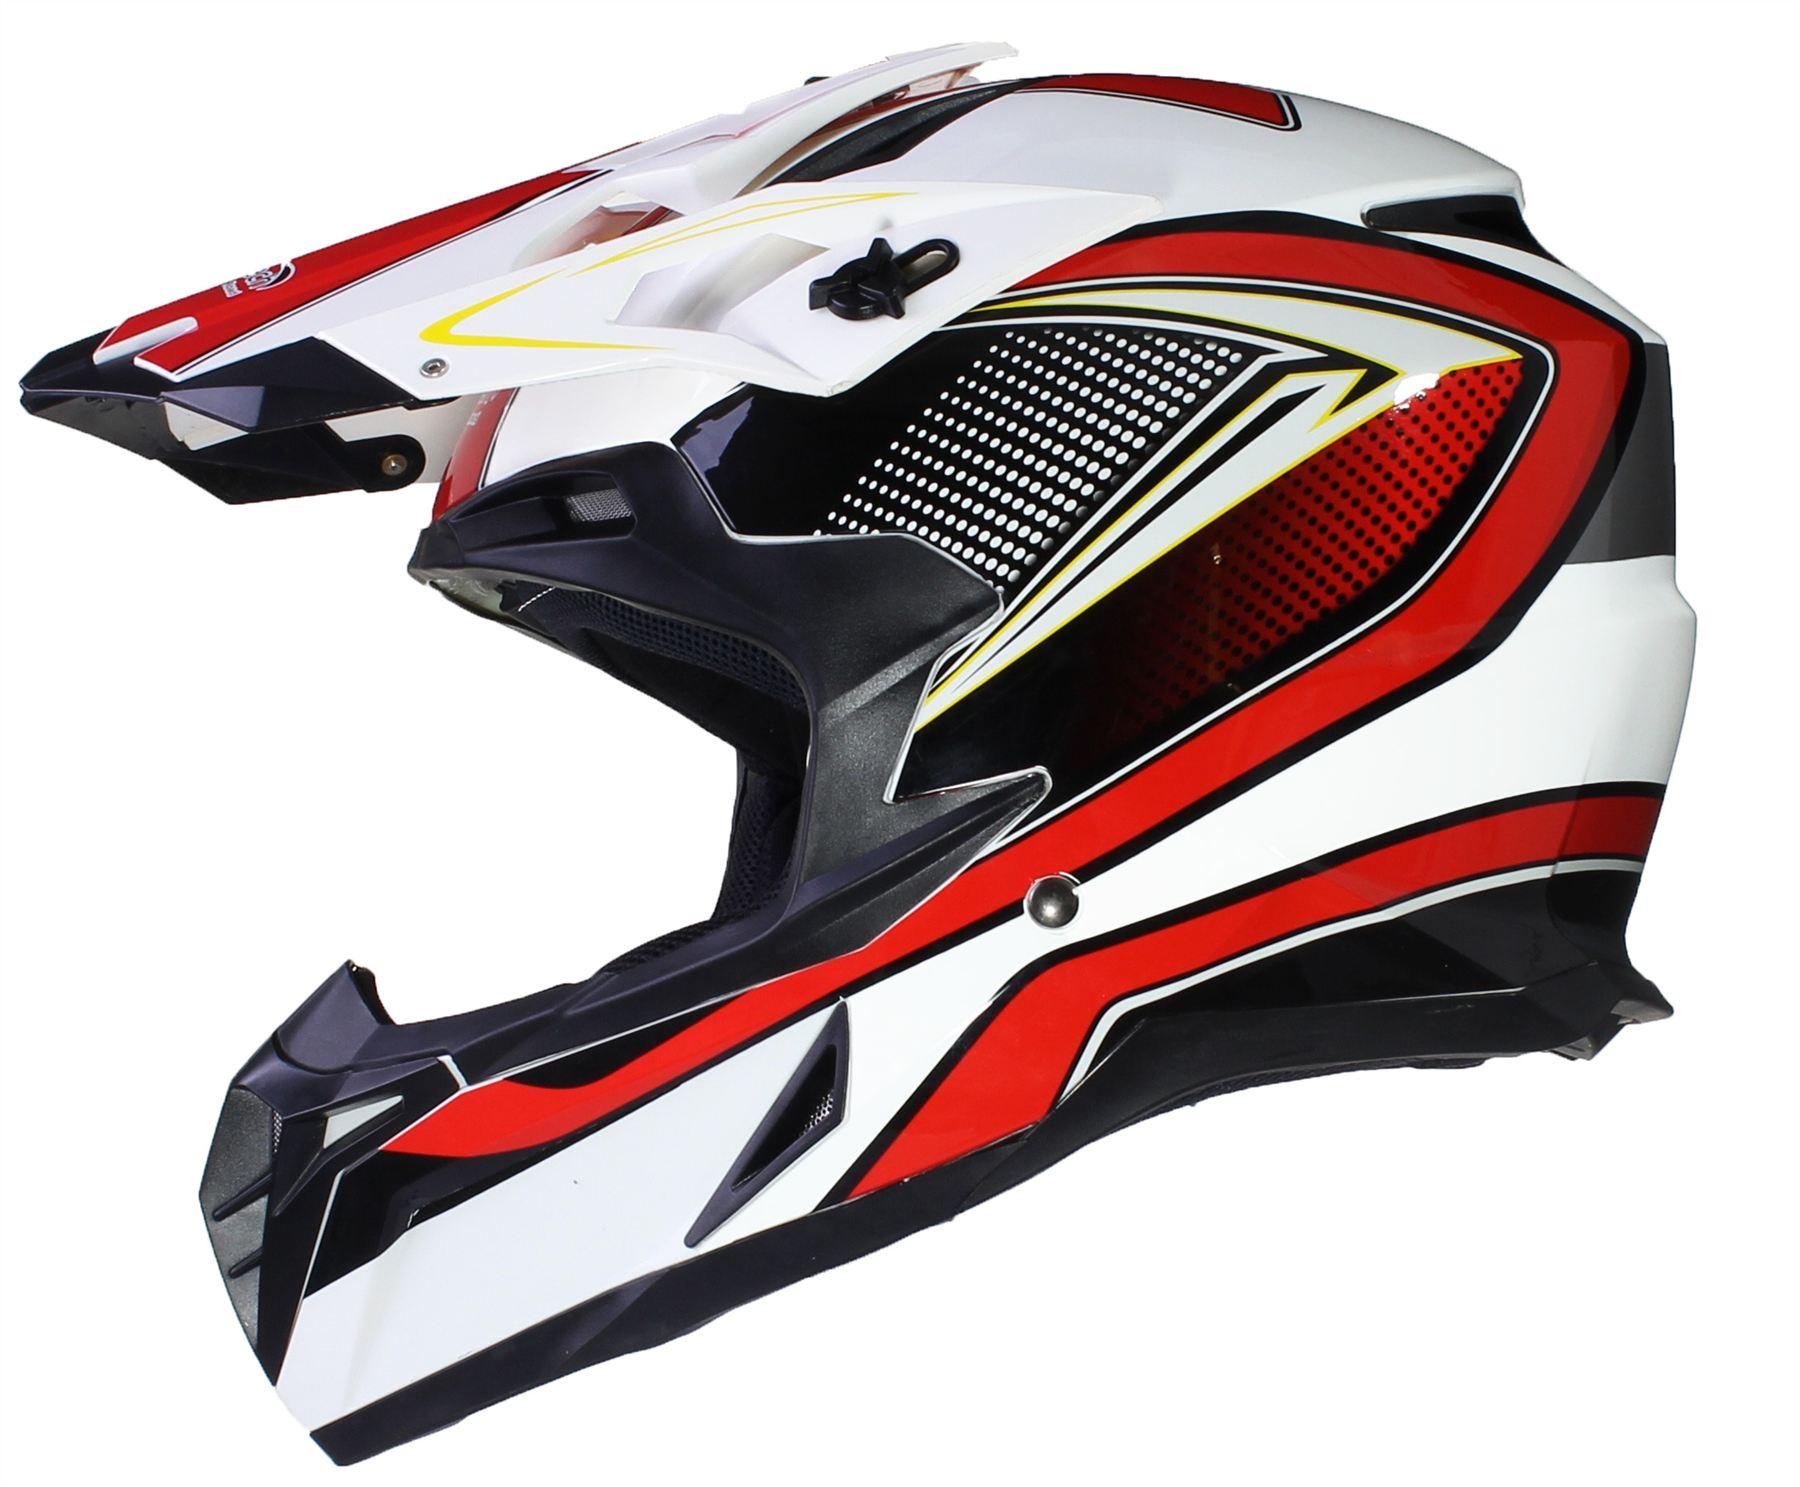 casque motocross moto enduro quad atv cross helm hors route fmx mx mtb. Black Bedroom Furniture Sets. Home Design Ideas